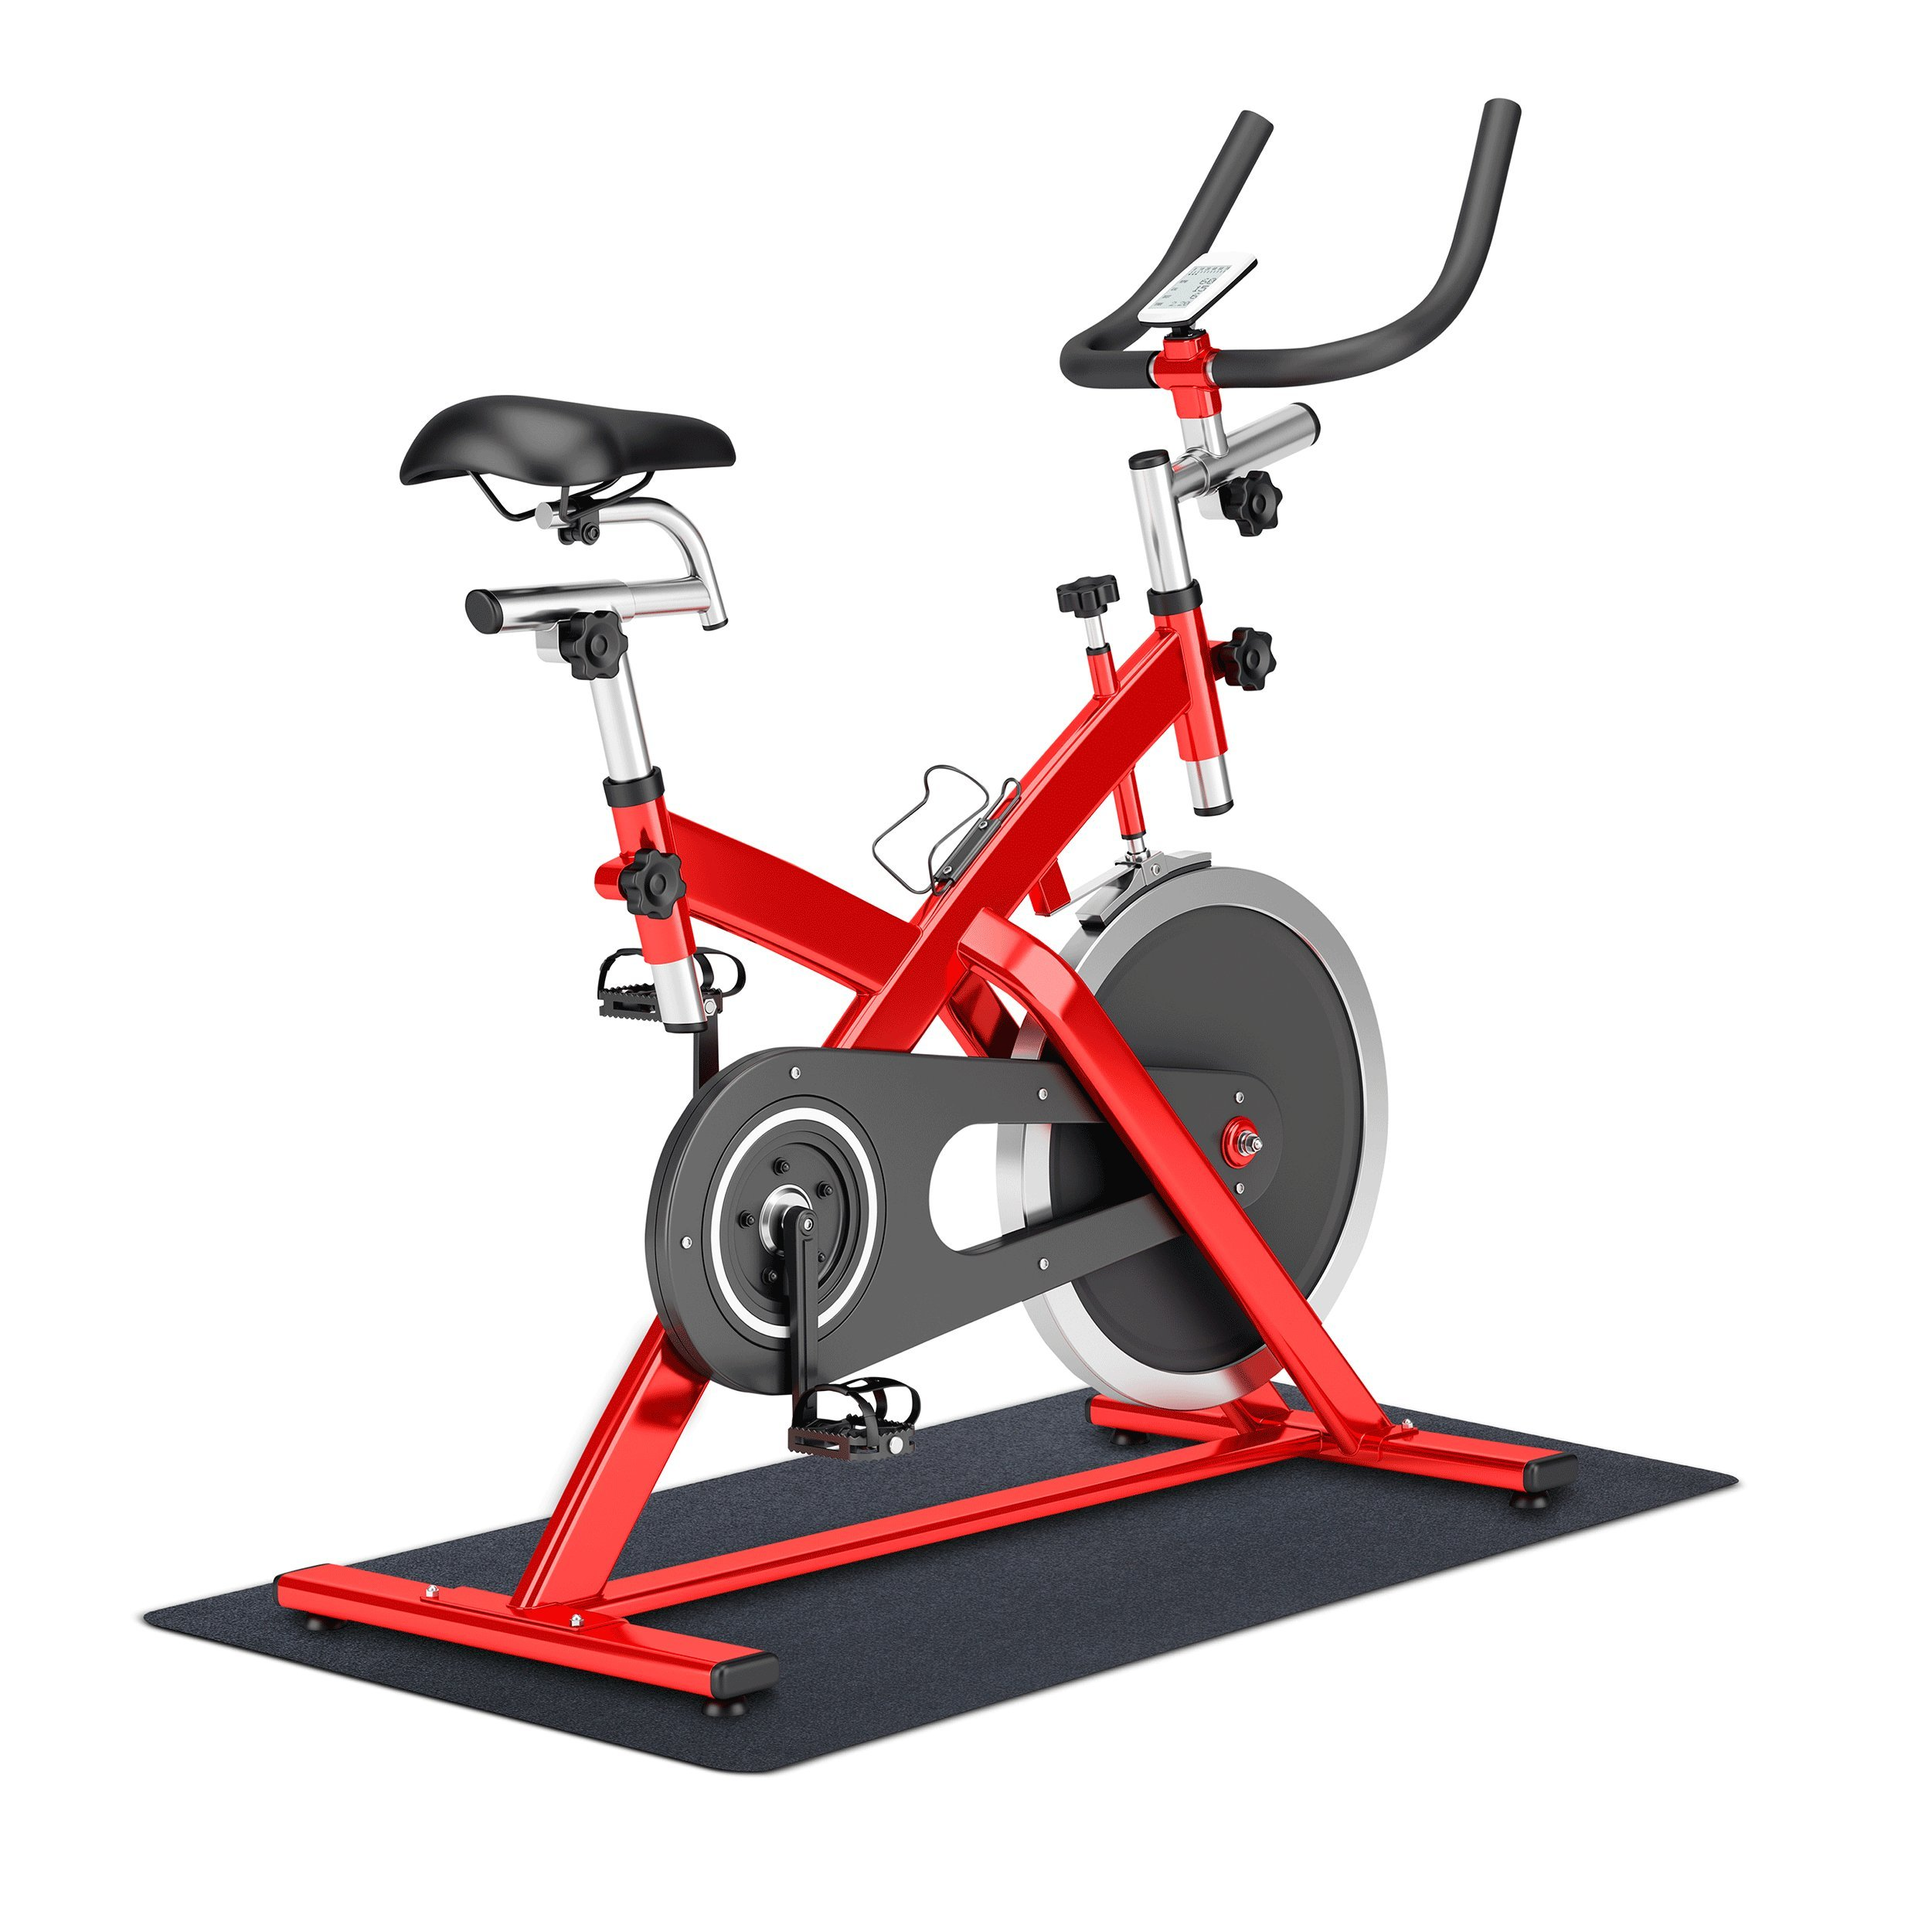 MotionTex 8M-110-24C-5 Fitness Equipment Mat, 24'' x 60'', Black